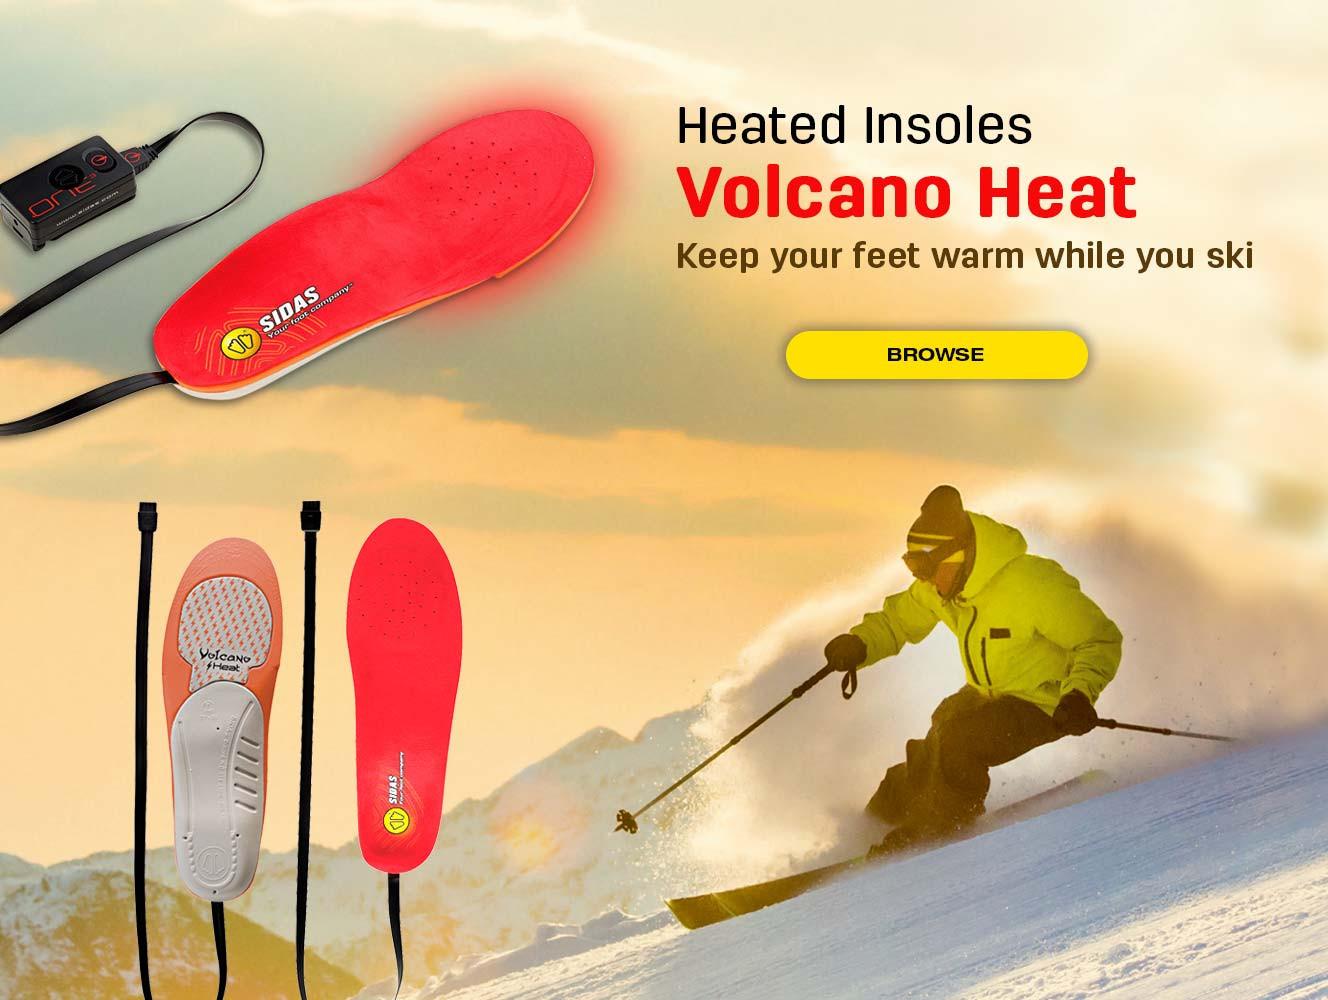 Keep your feet warm while you ski